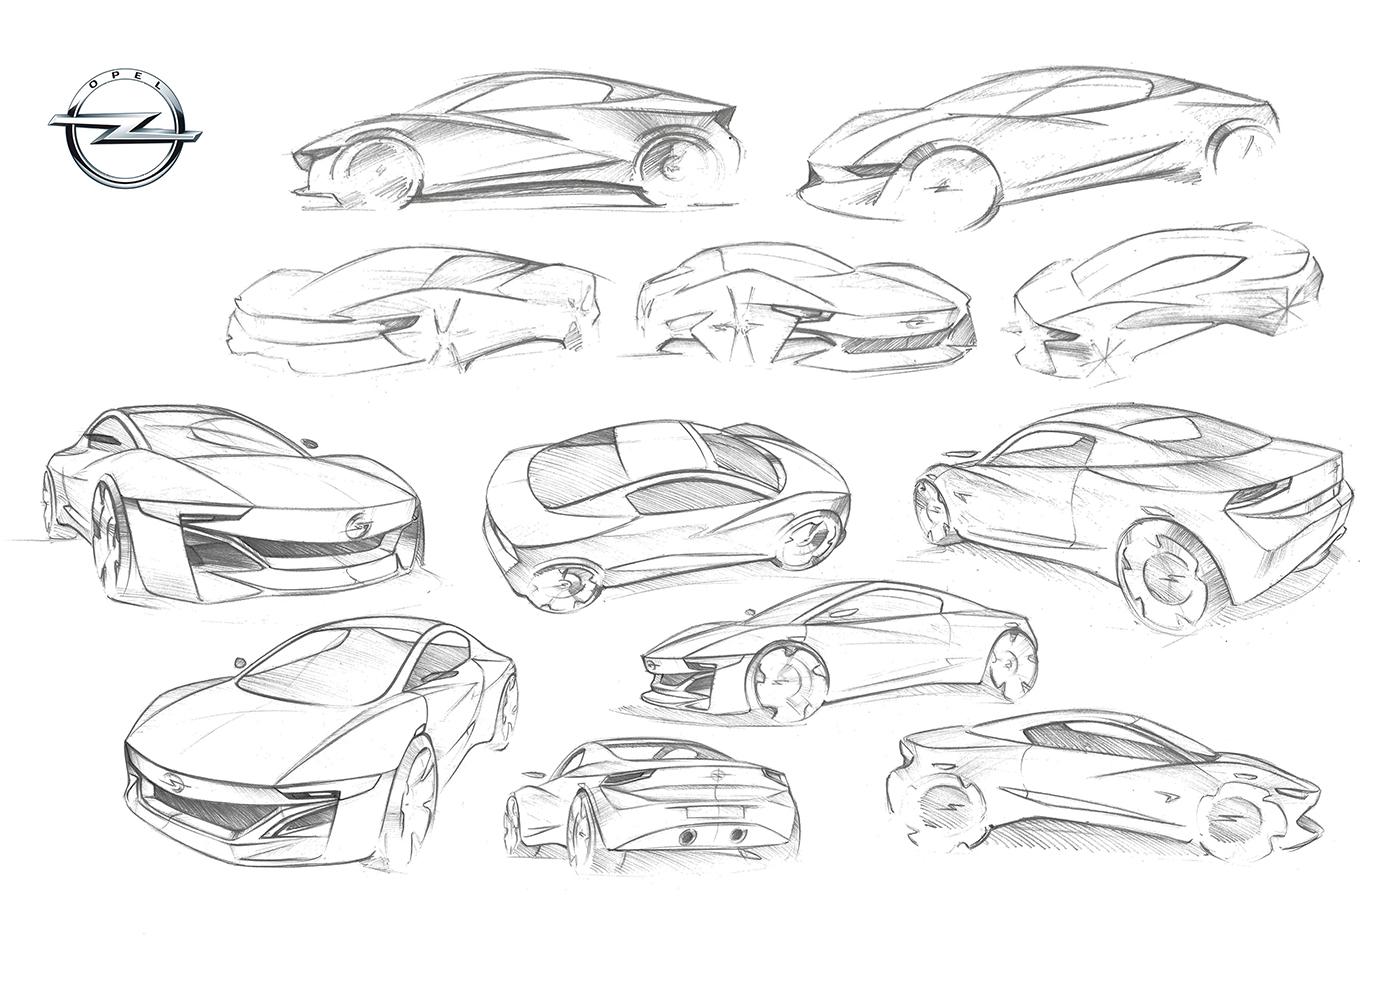 Opel Tigra Redesign By Kamil Podolak